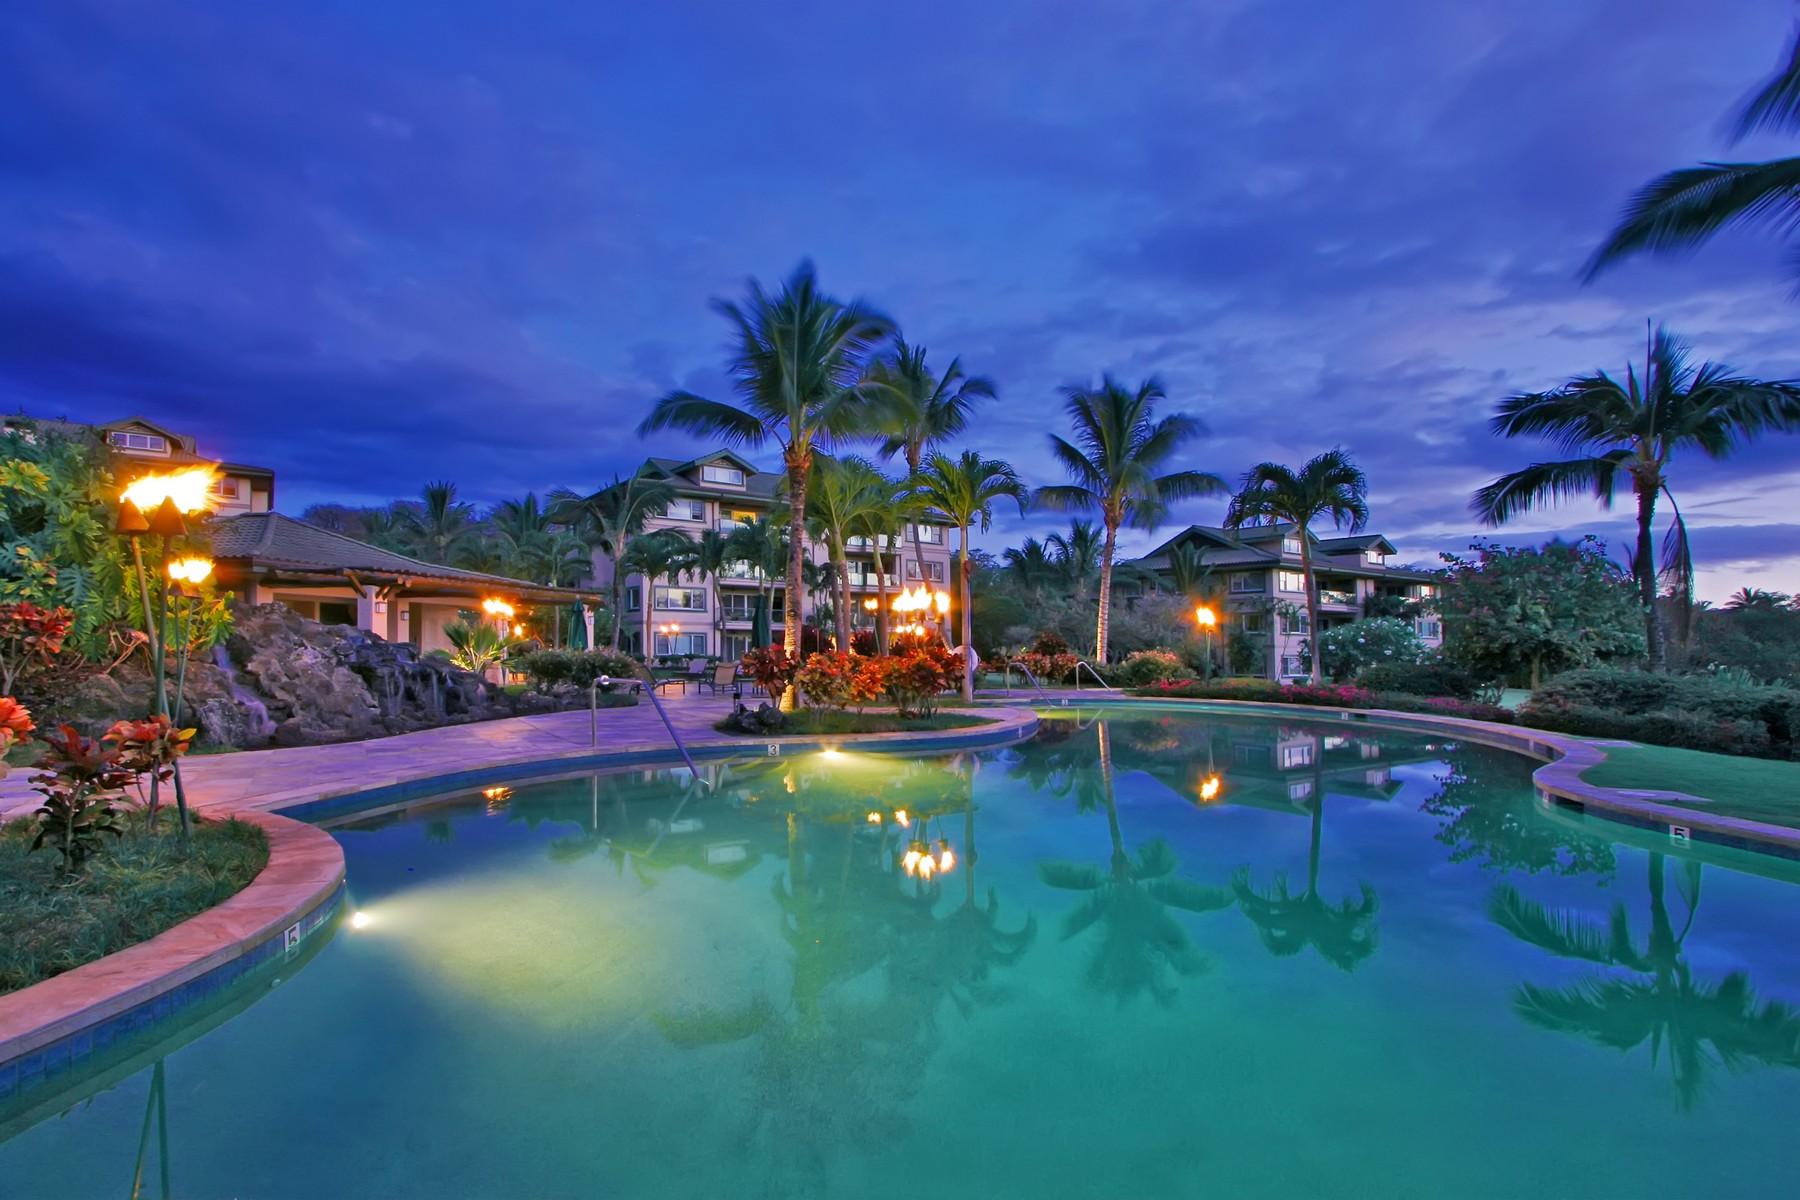 Condominium for Sale at Spectacular Makena Maui-Na Hale O Makena 4955 Makena Road, Na Hale O Makena A102 Makena, Hawaii, 96753 United States